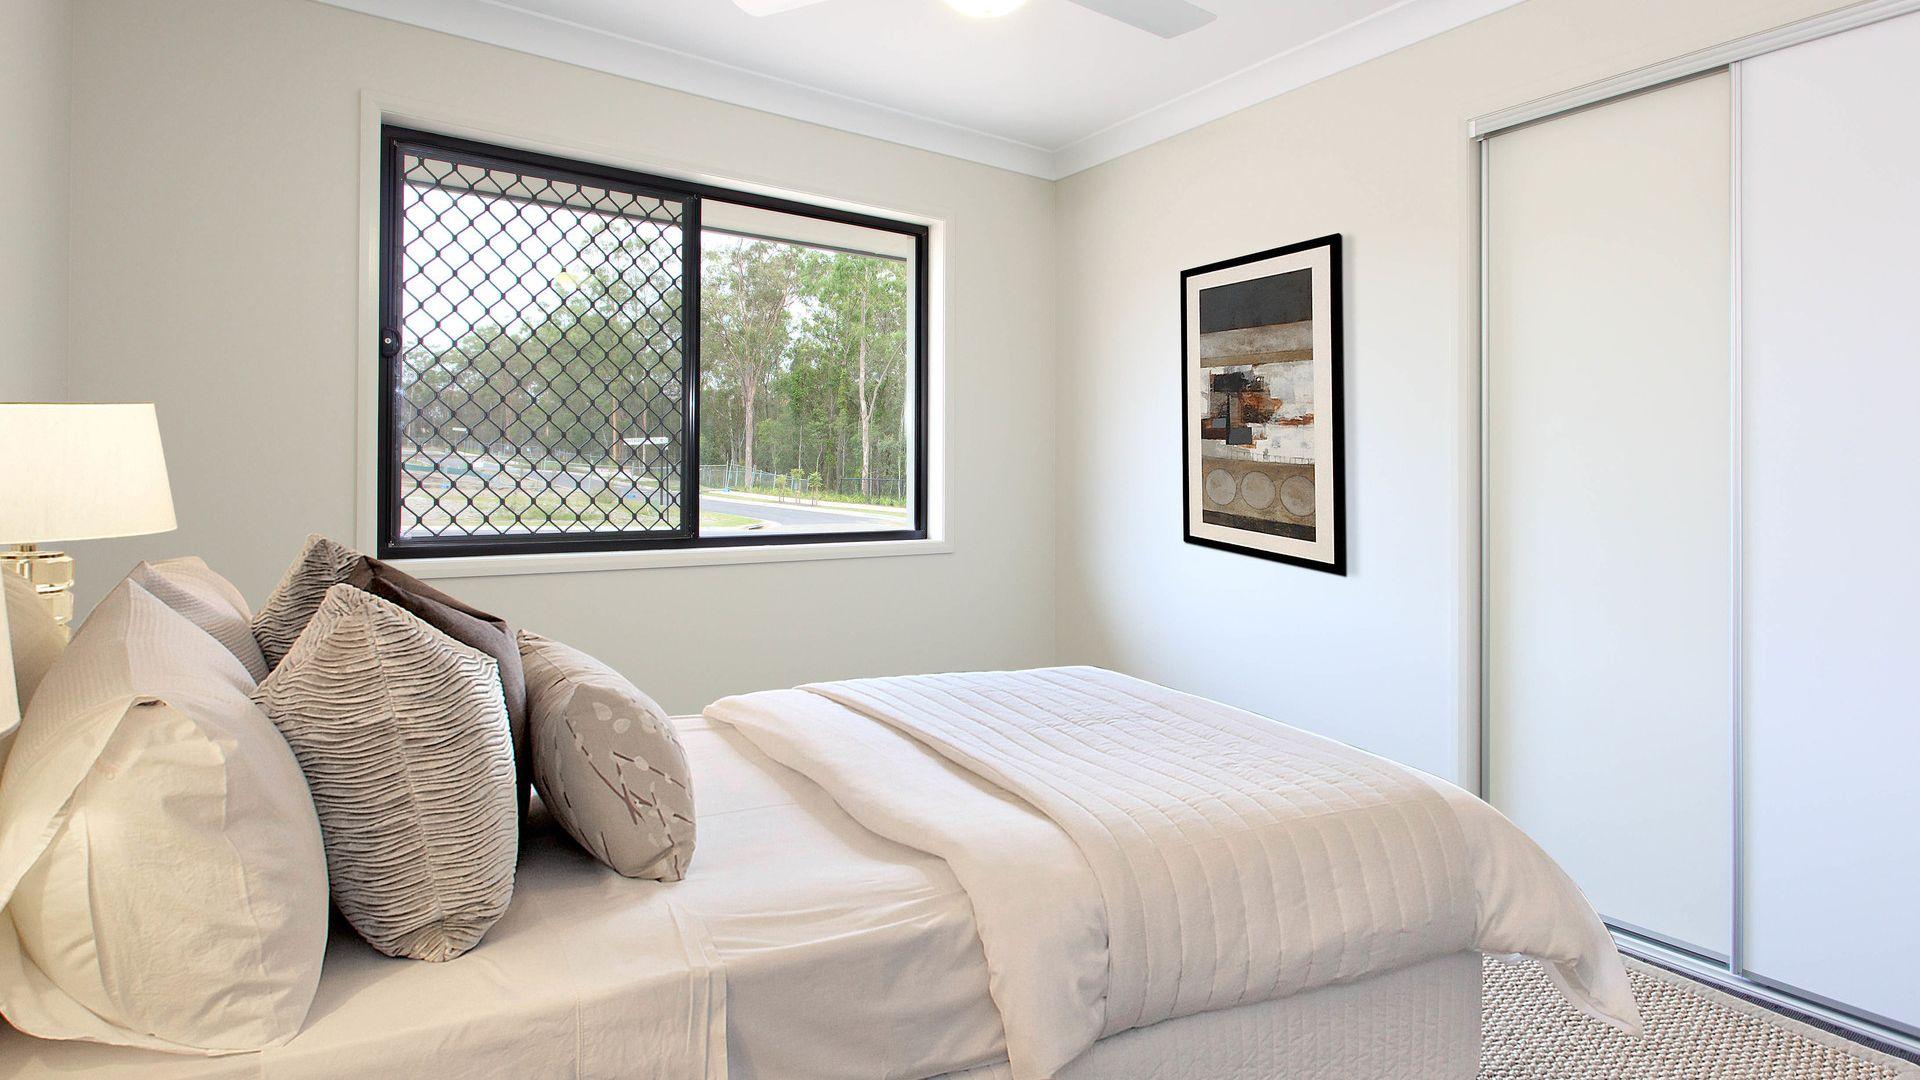 Lot 132 Hayfield Estate, Ripley QLD 4306, Image 1